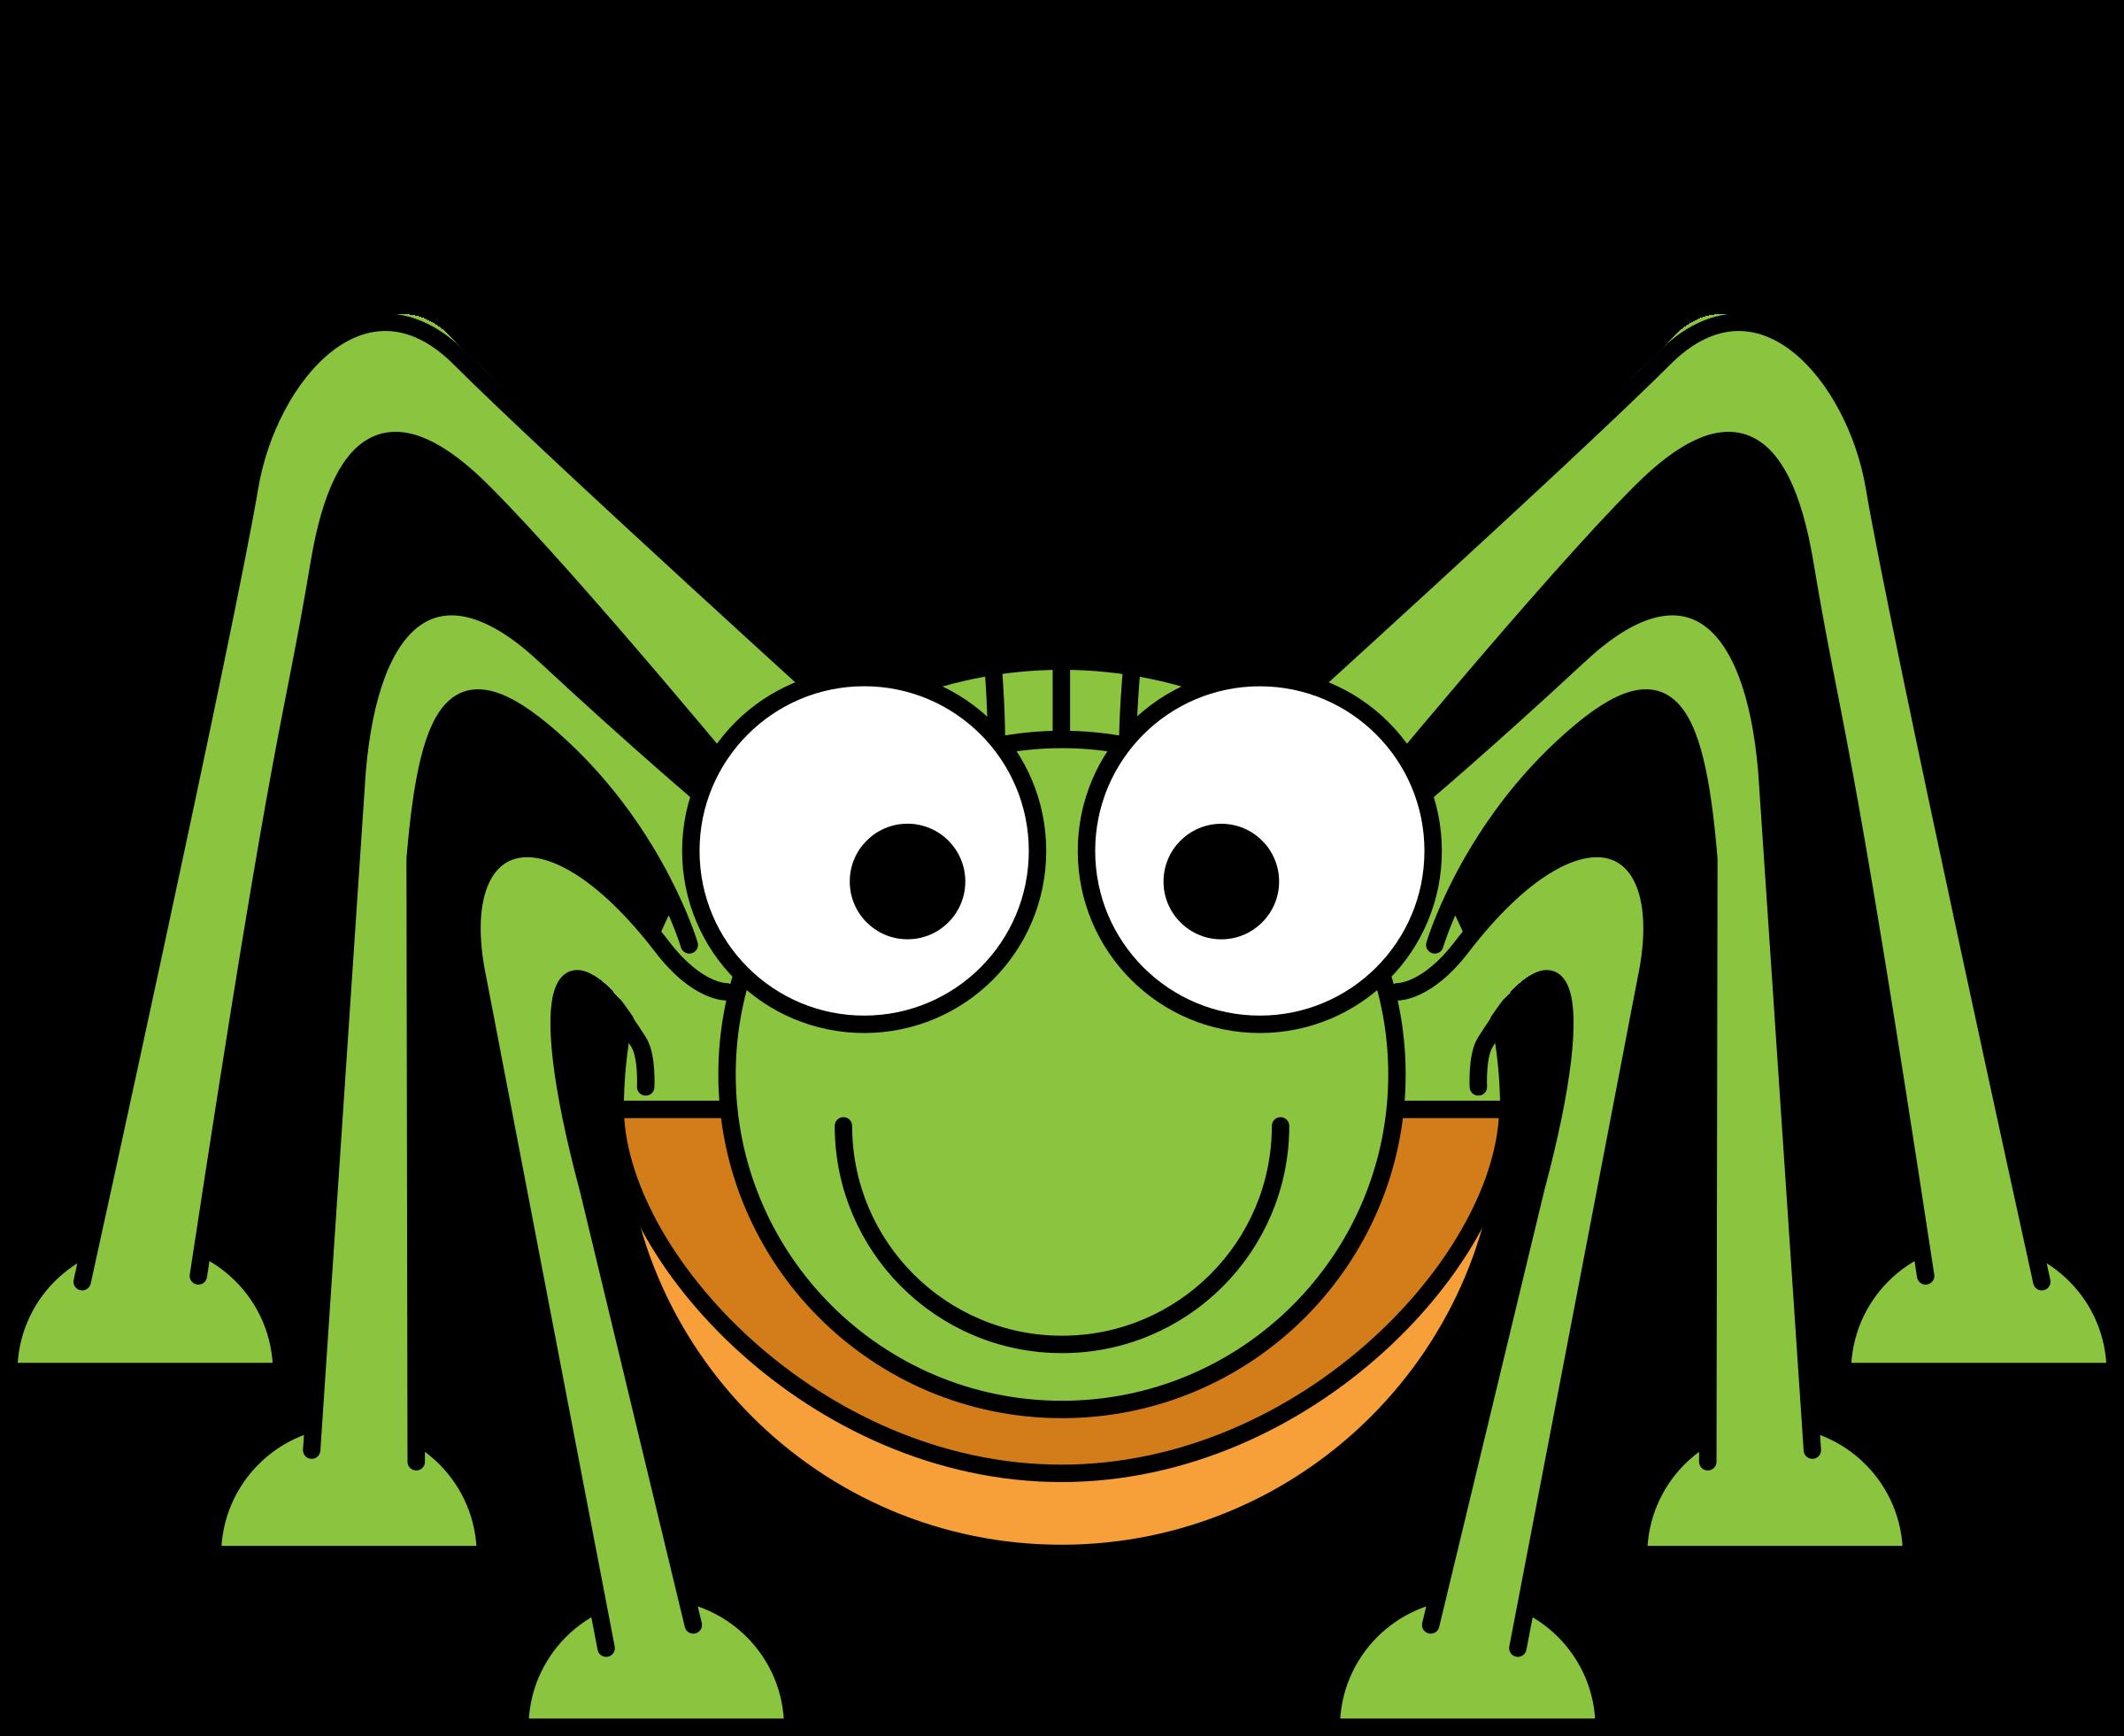 jpg royalty free stock Cartoon Grasshopper Icons PNG